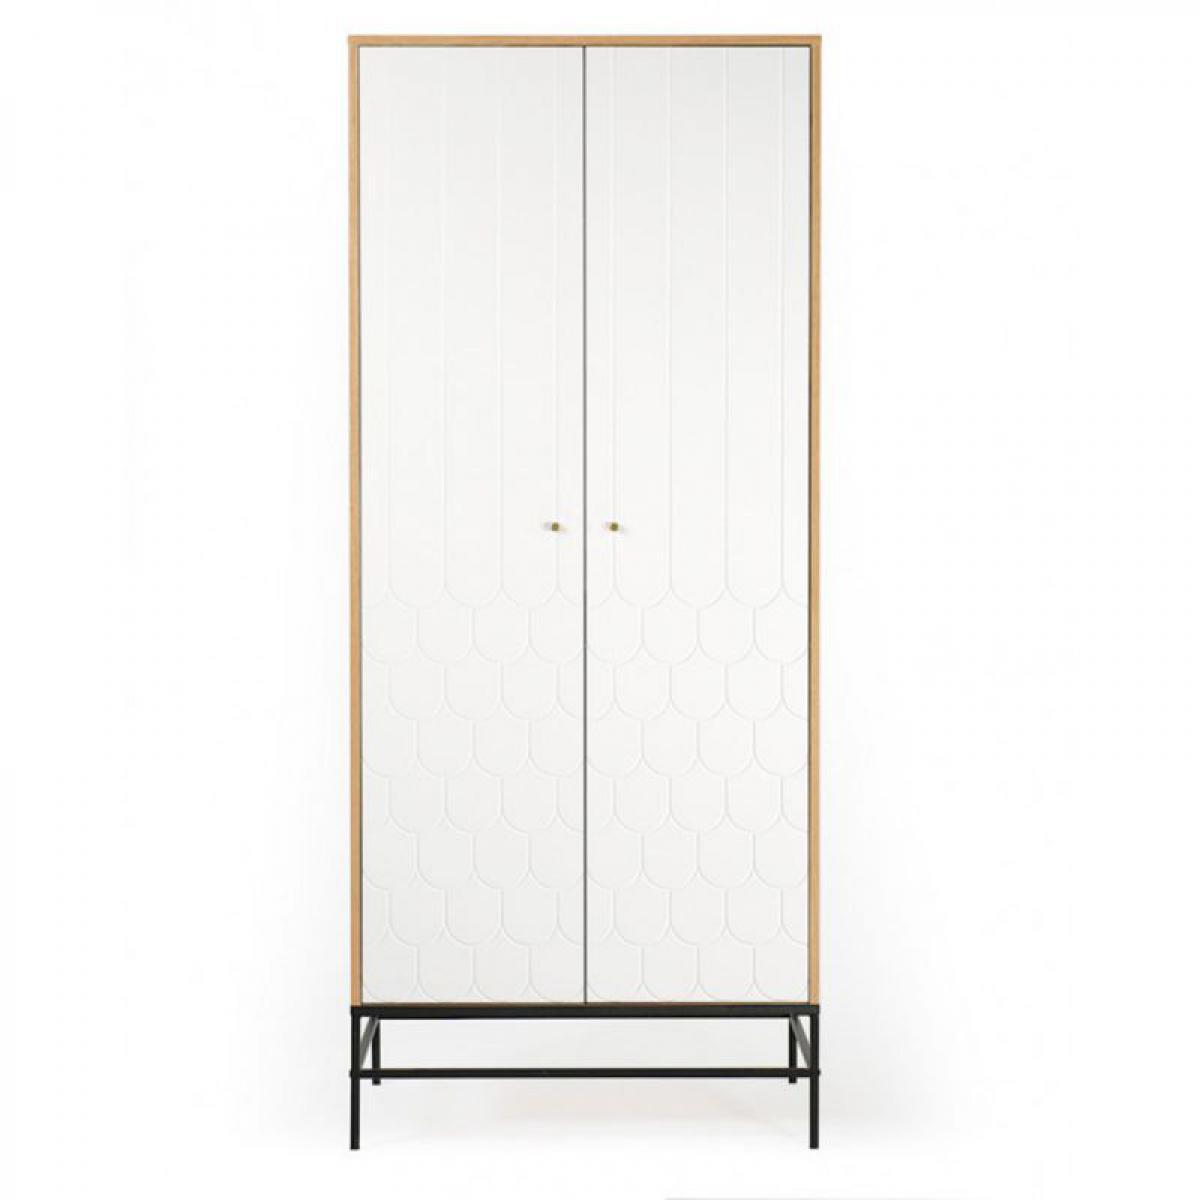 Paris Prix Armoire 2 Portes Design Lia 190cm Blanc